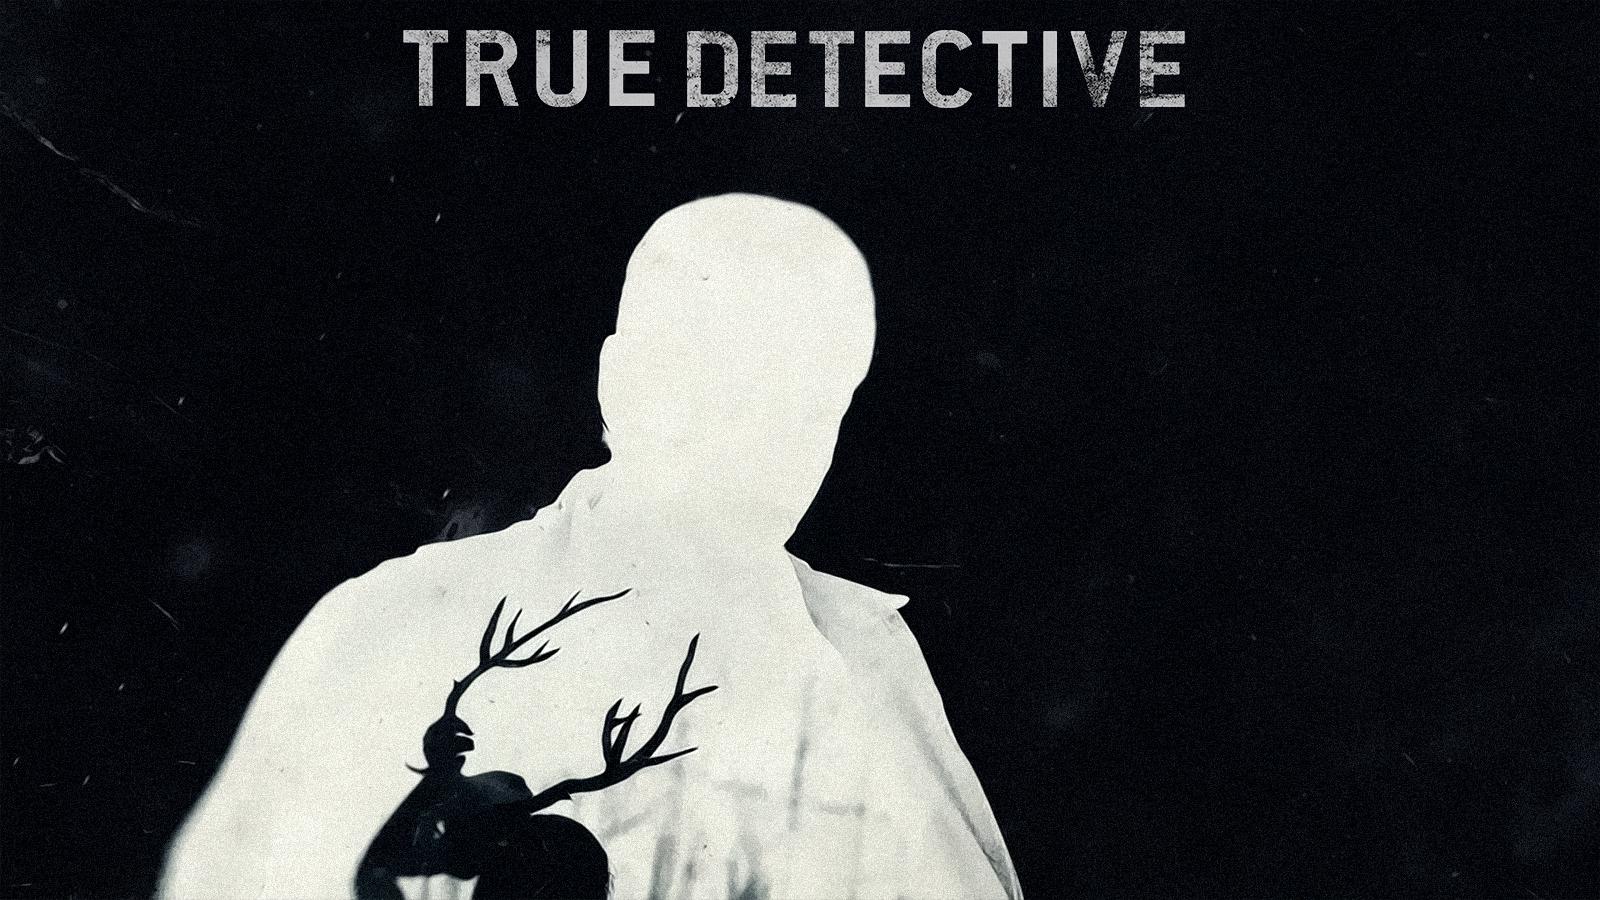 True Detective minimalism